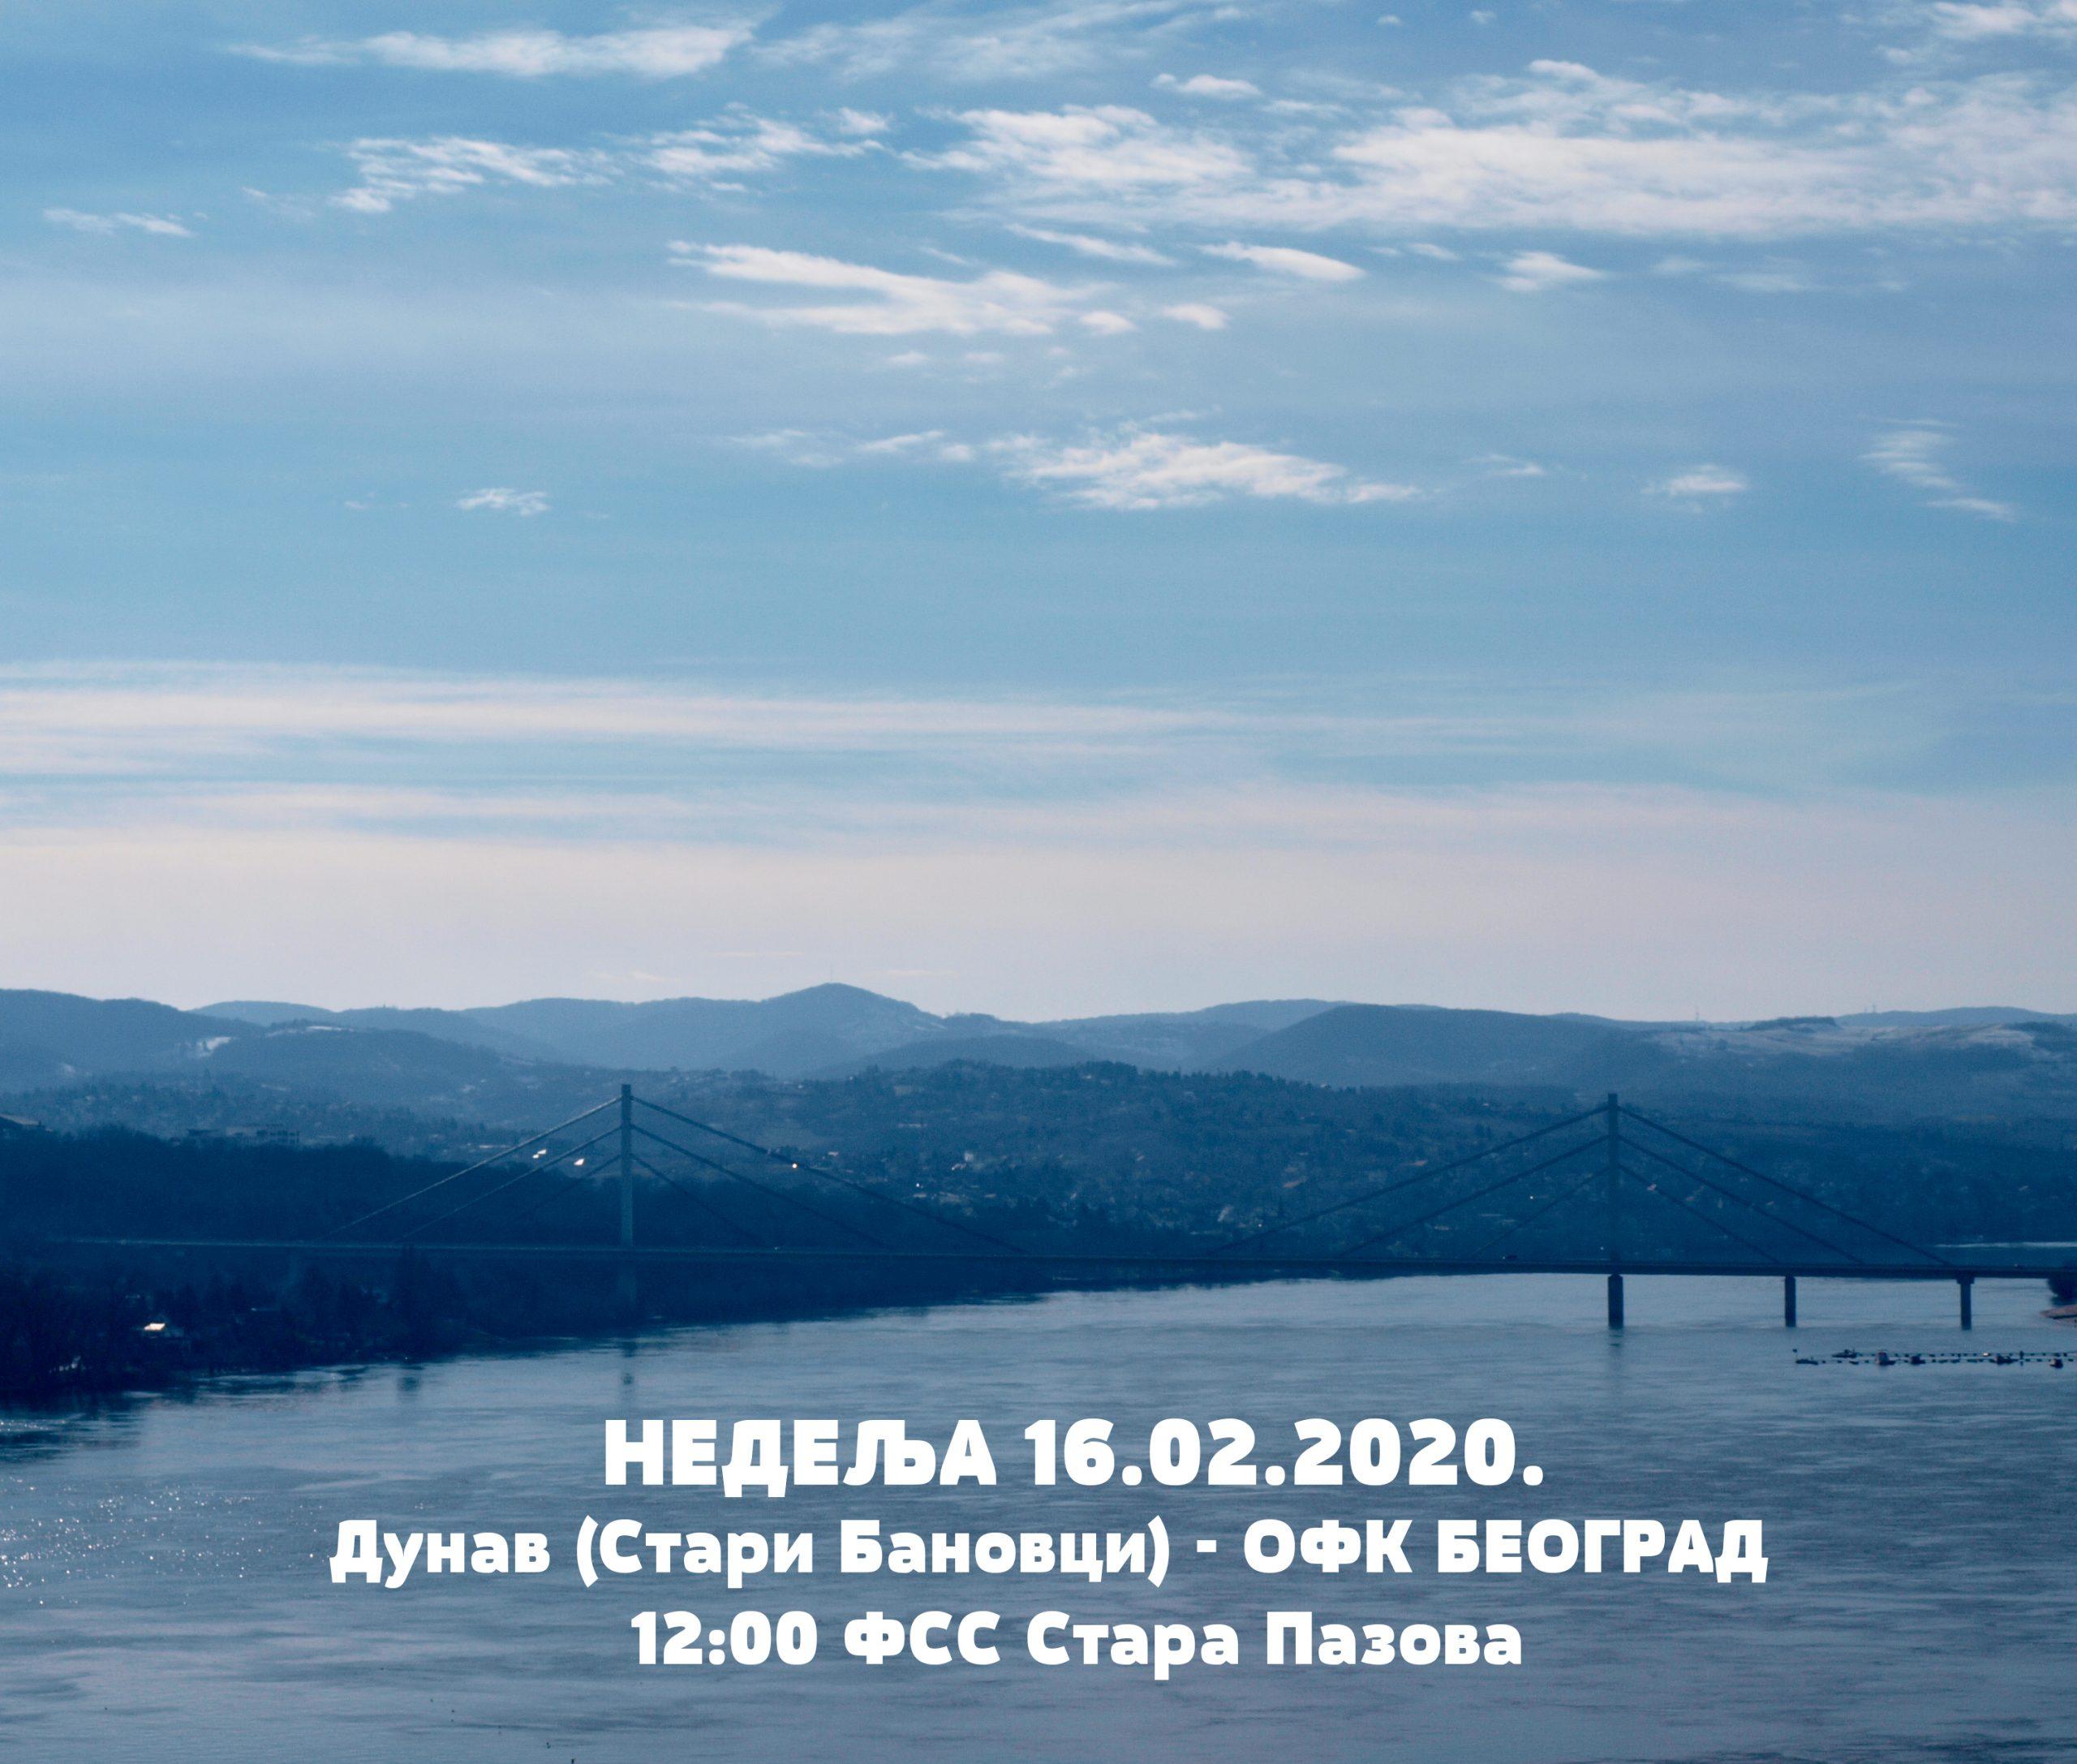 Nova provera plavo belih, nedelja 16.02. – vs Dunav (Stara Pazova)